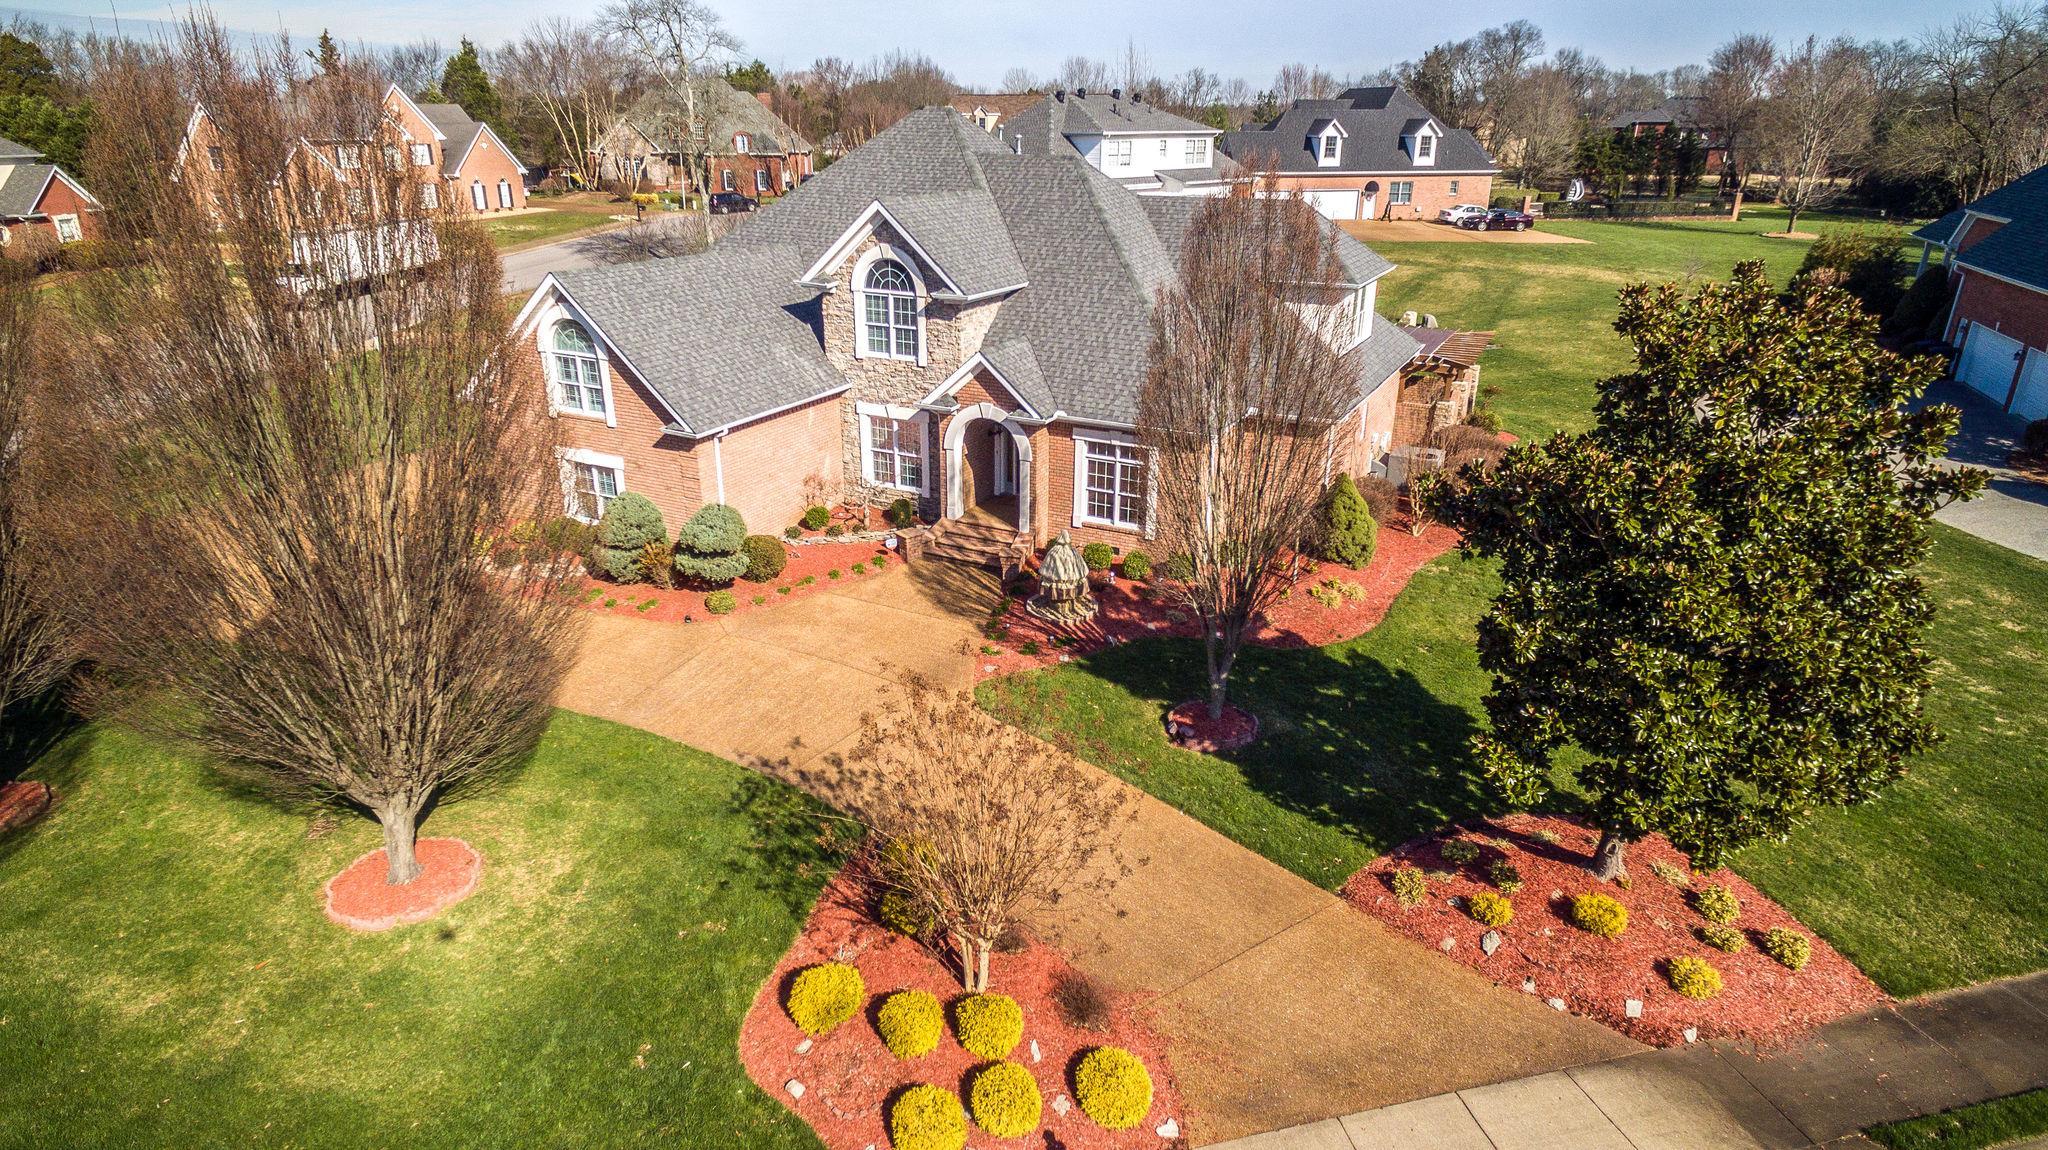 2225 Meadowcrest Cv, Murfreesboro, TN 37129 - Murfreesboro, TN real estate listing